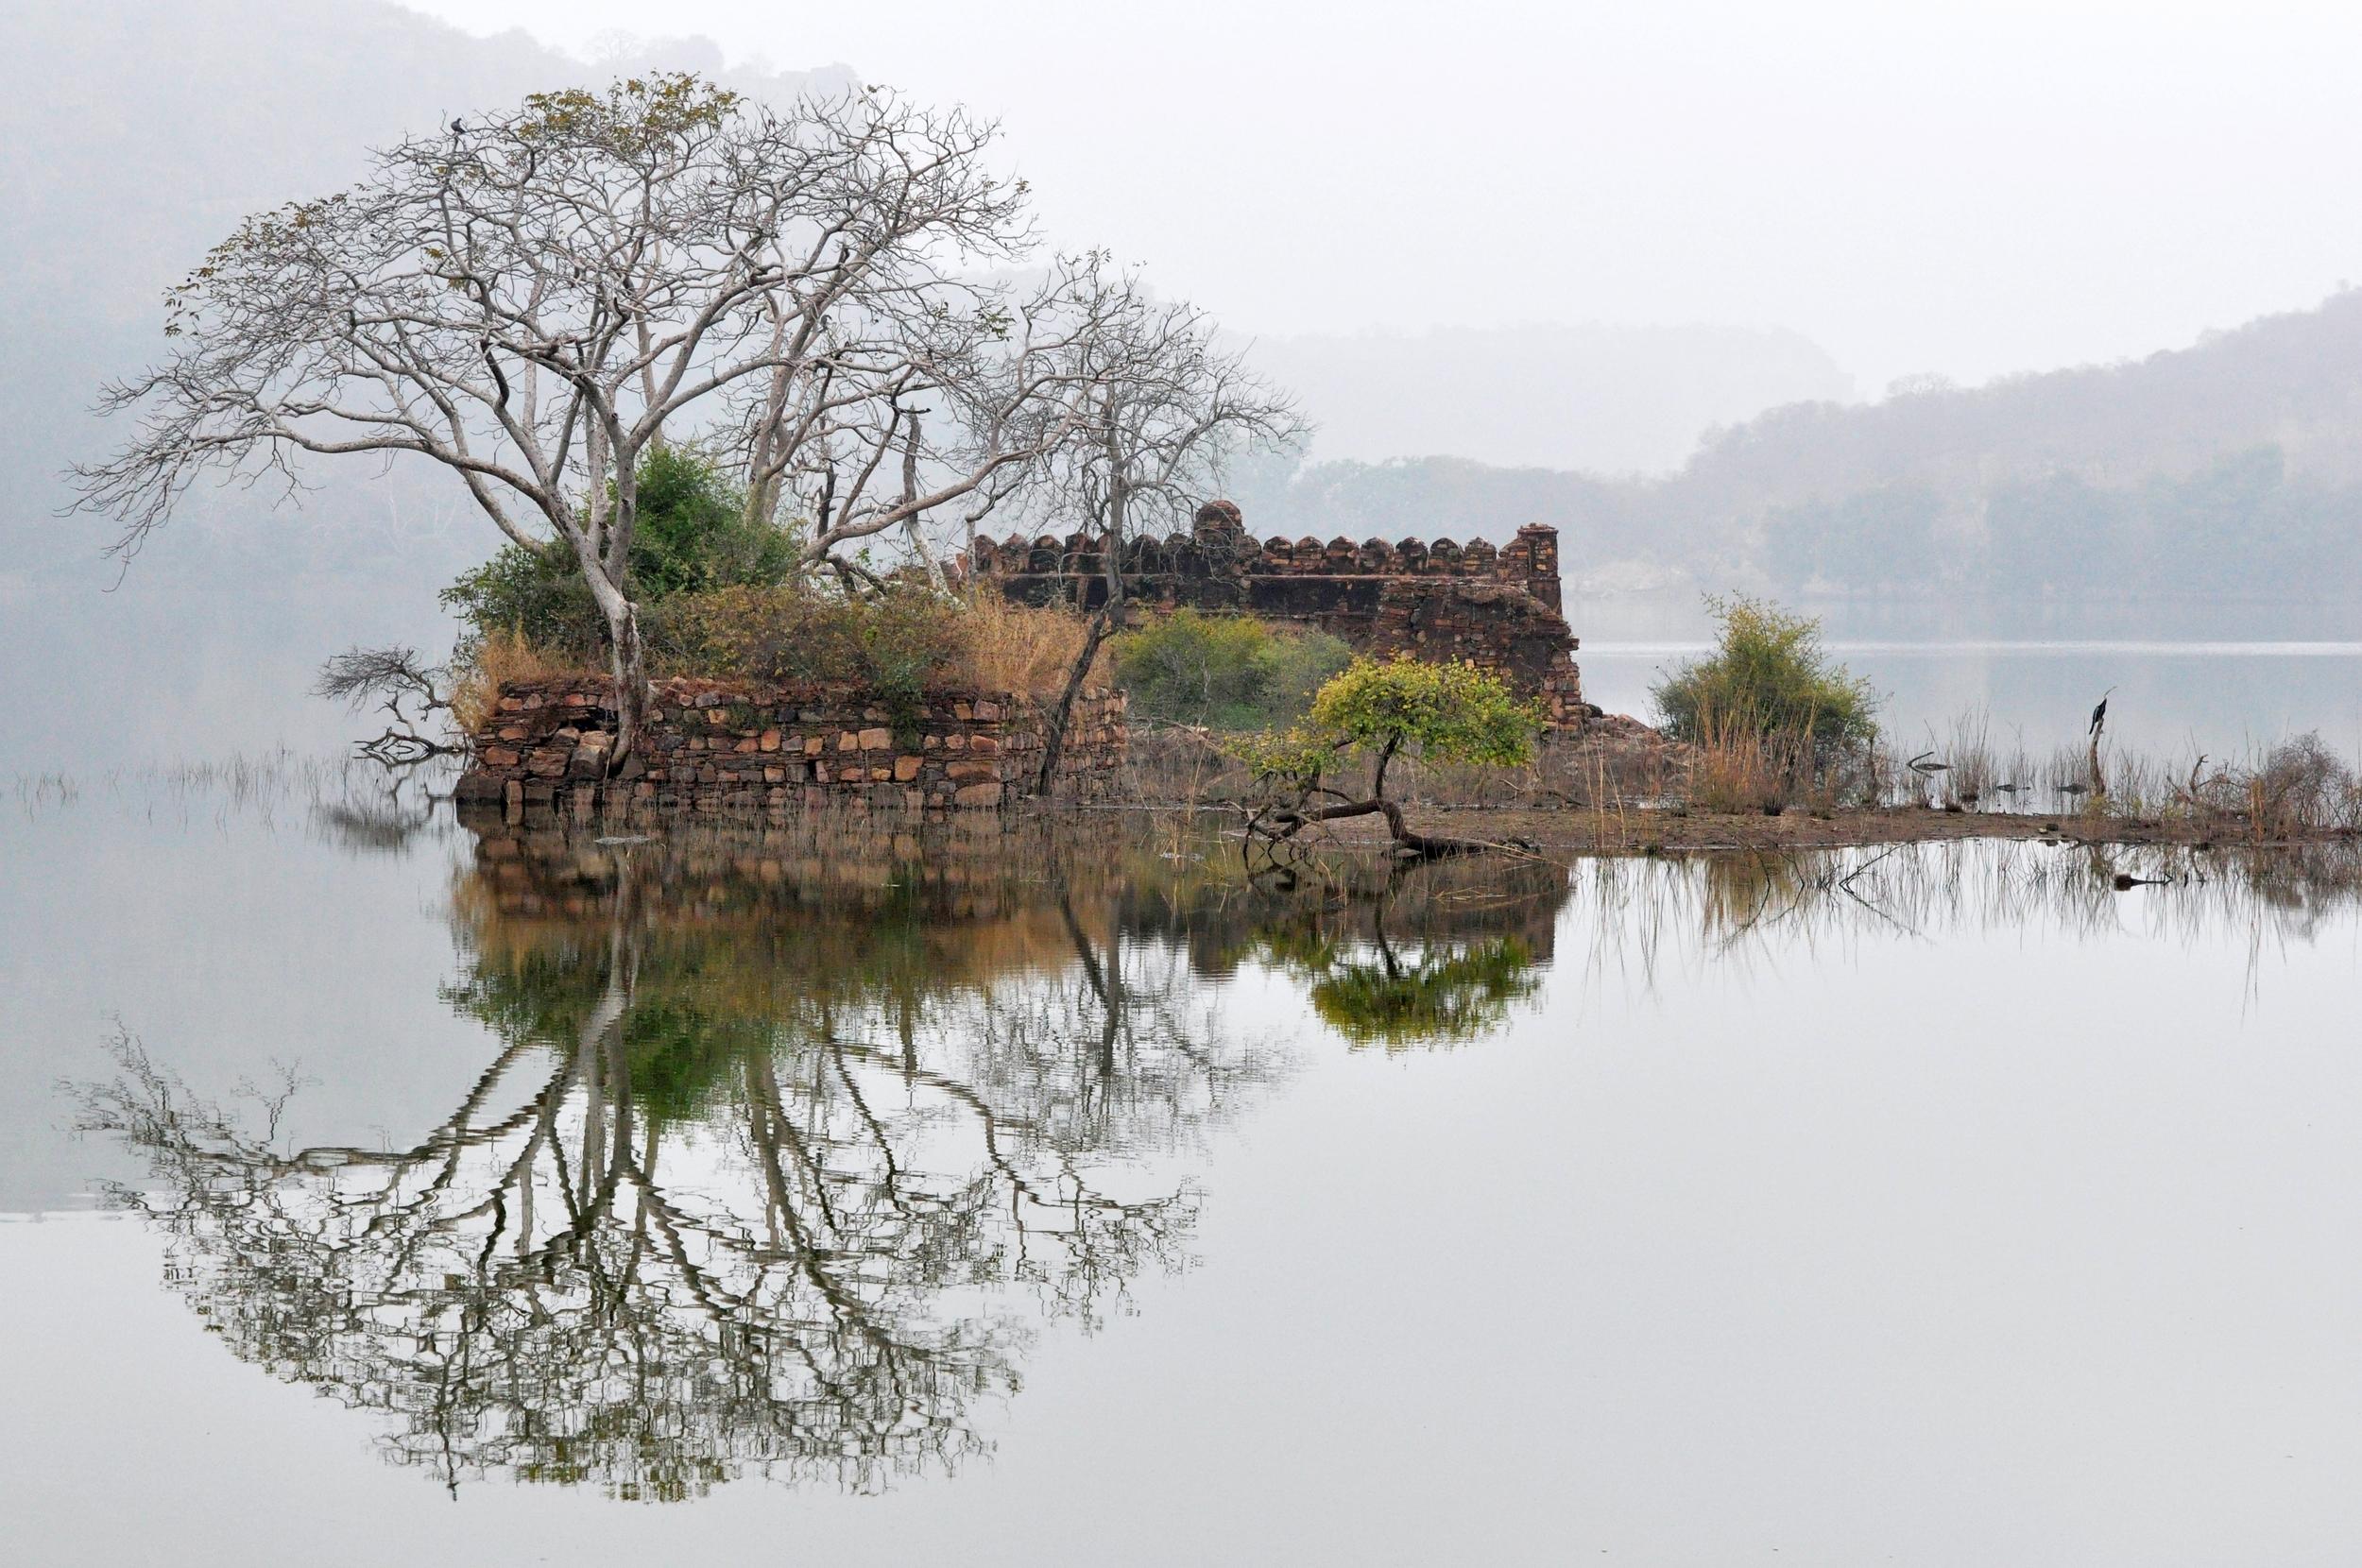 Ranthambore Lake, India